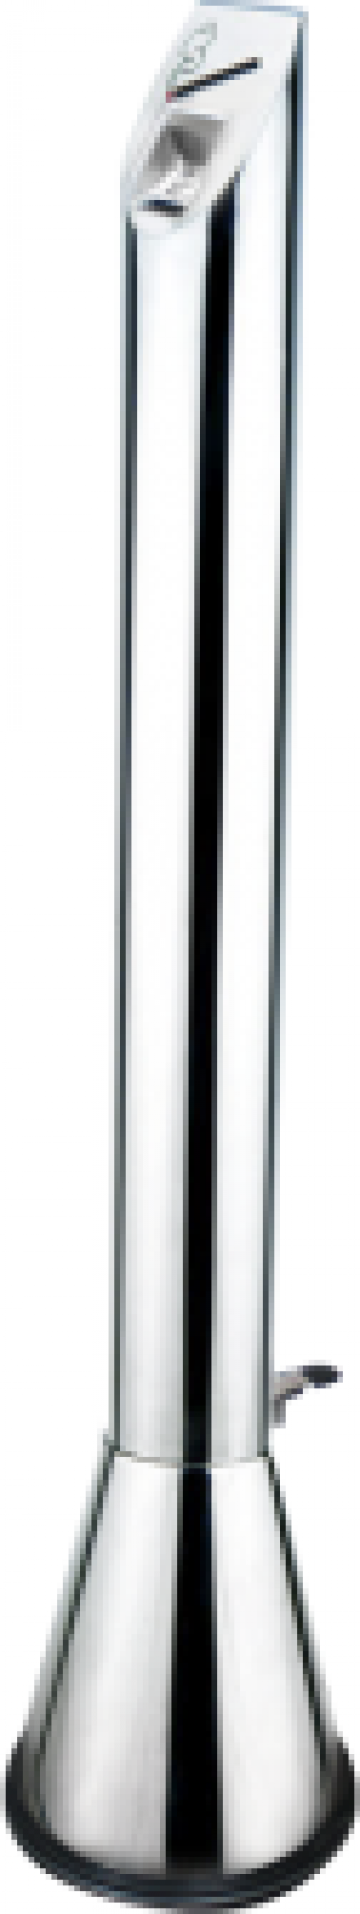 Scrumiera crom exterioara Icikala 12xh110cm de la Basarom Com